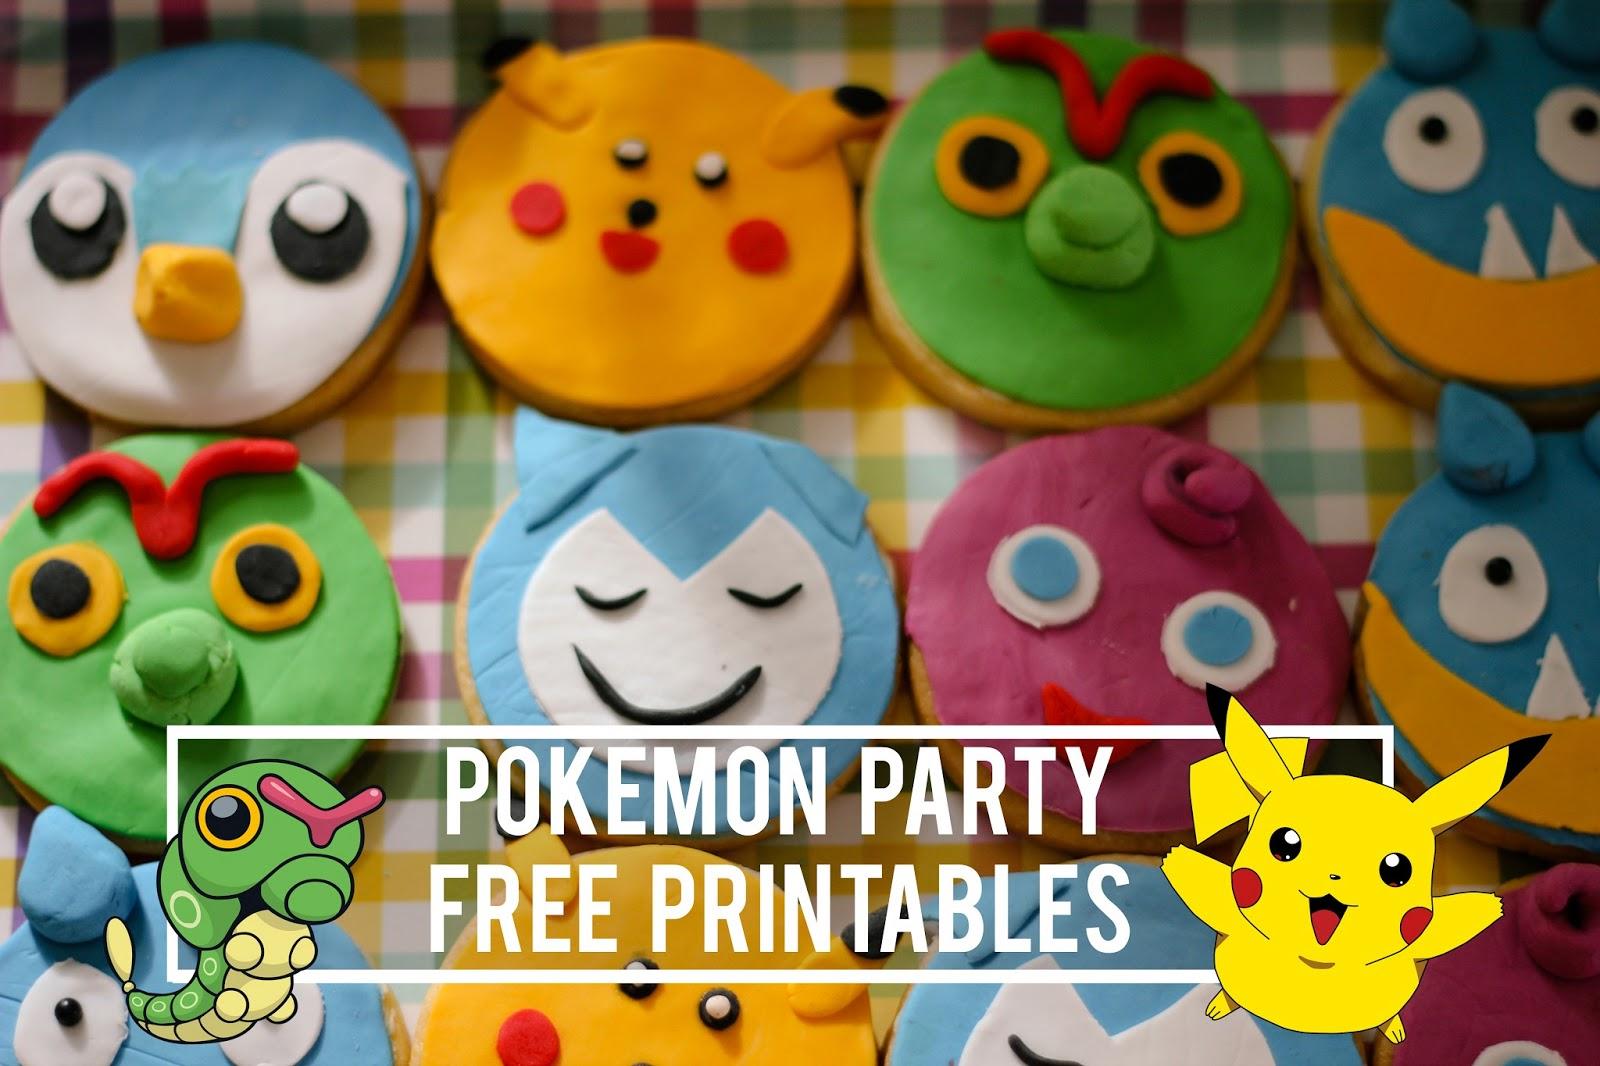 Pokemon party free printables | Maxabella Loves